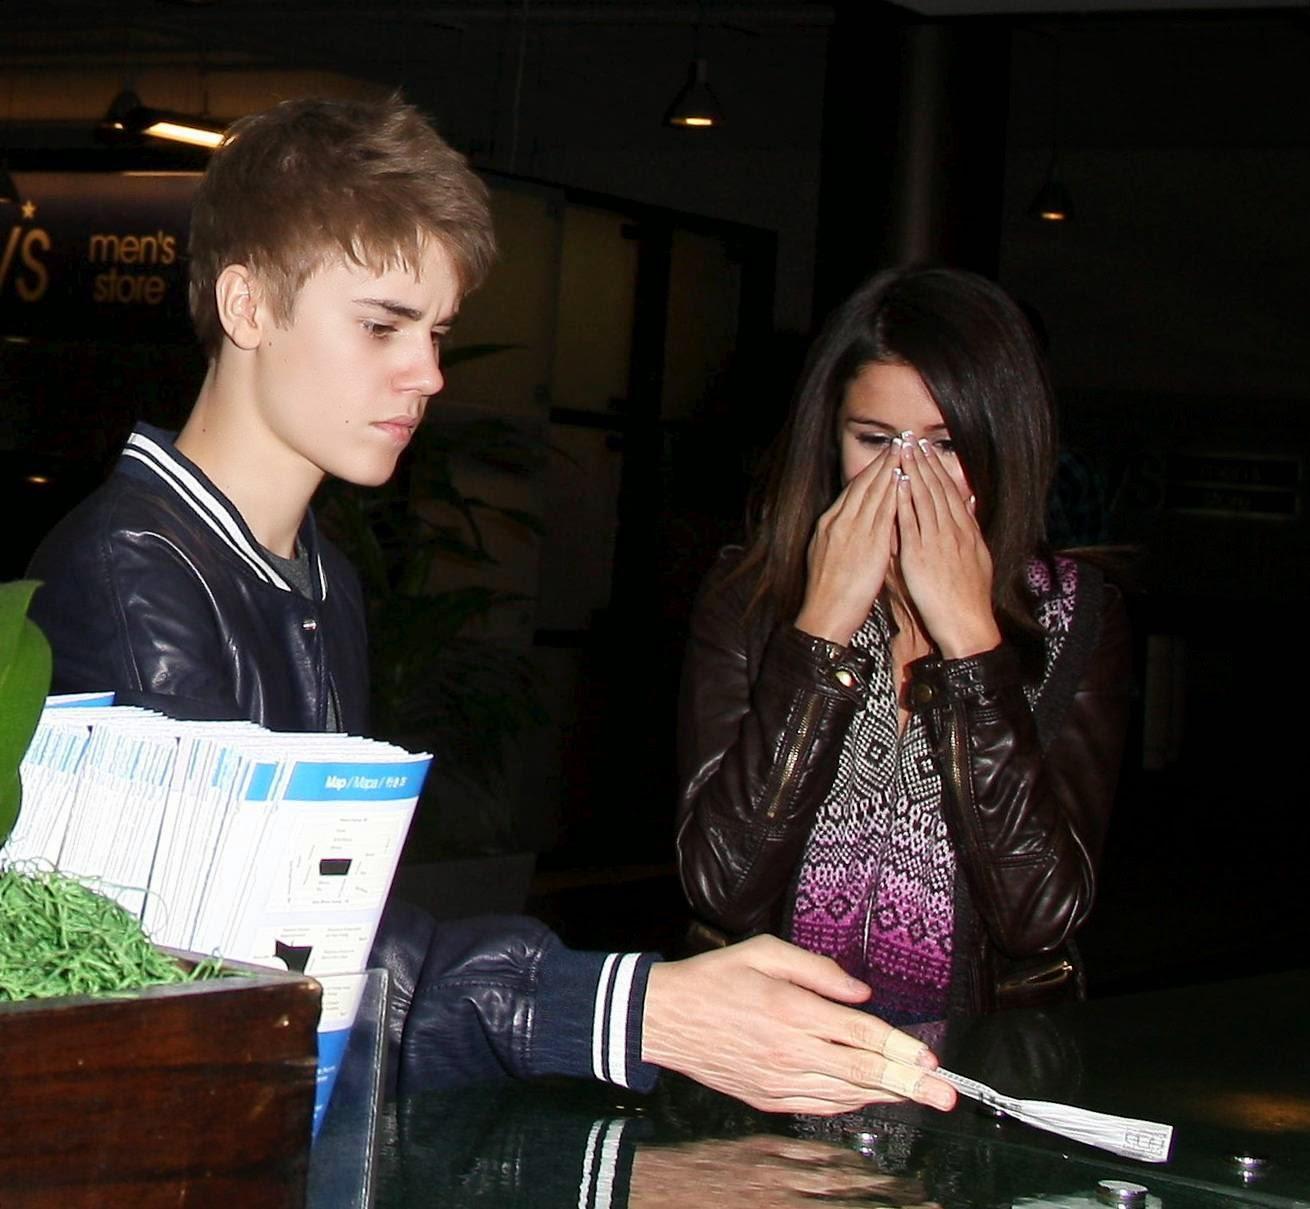 Justin Bieber Hd Wallpapers 2012